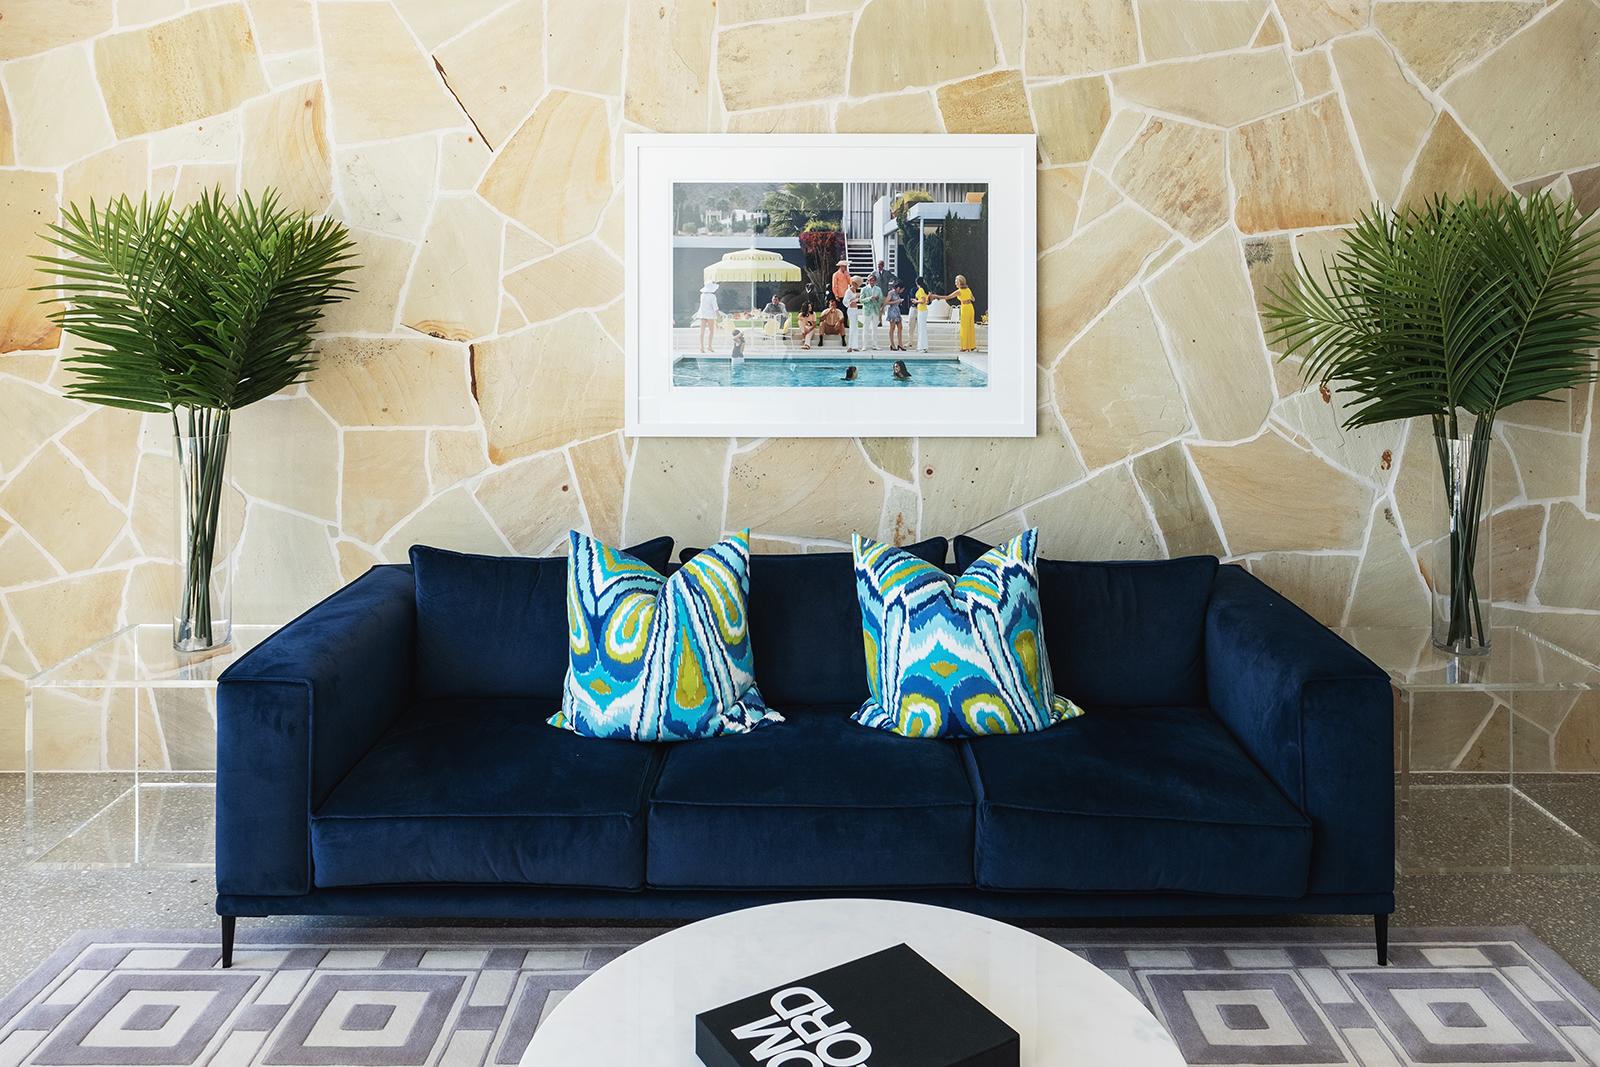 aston_milan_living_room_palm_springs_style_navy_sofa.jpg